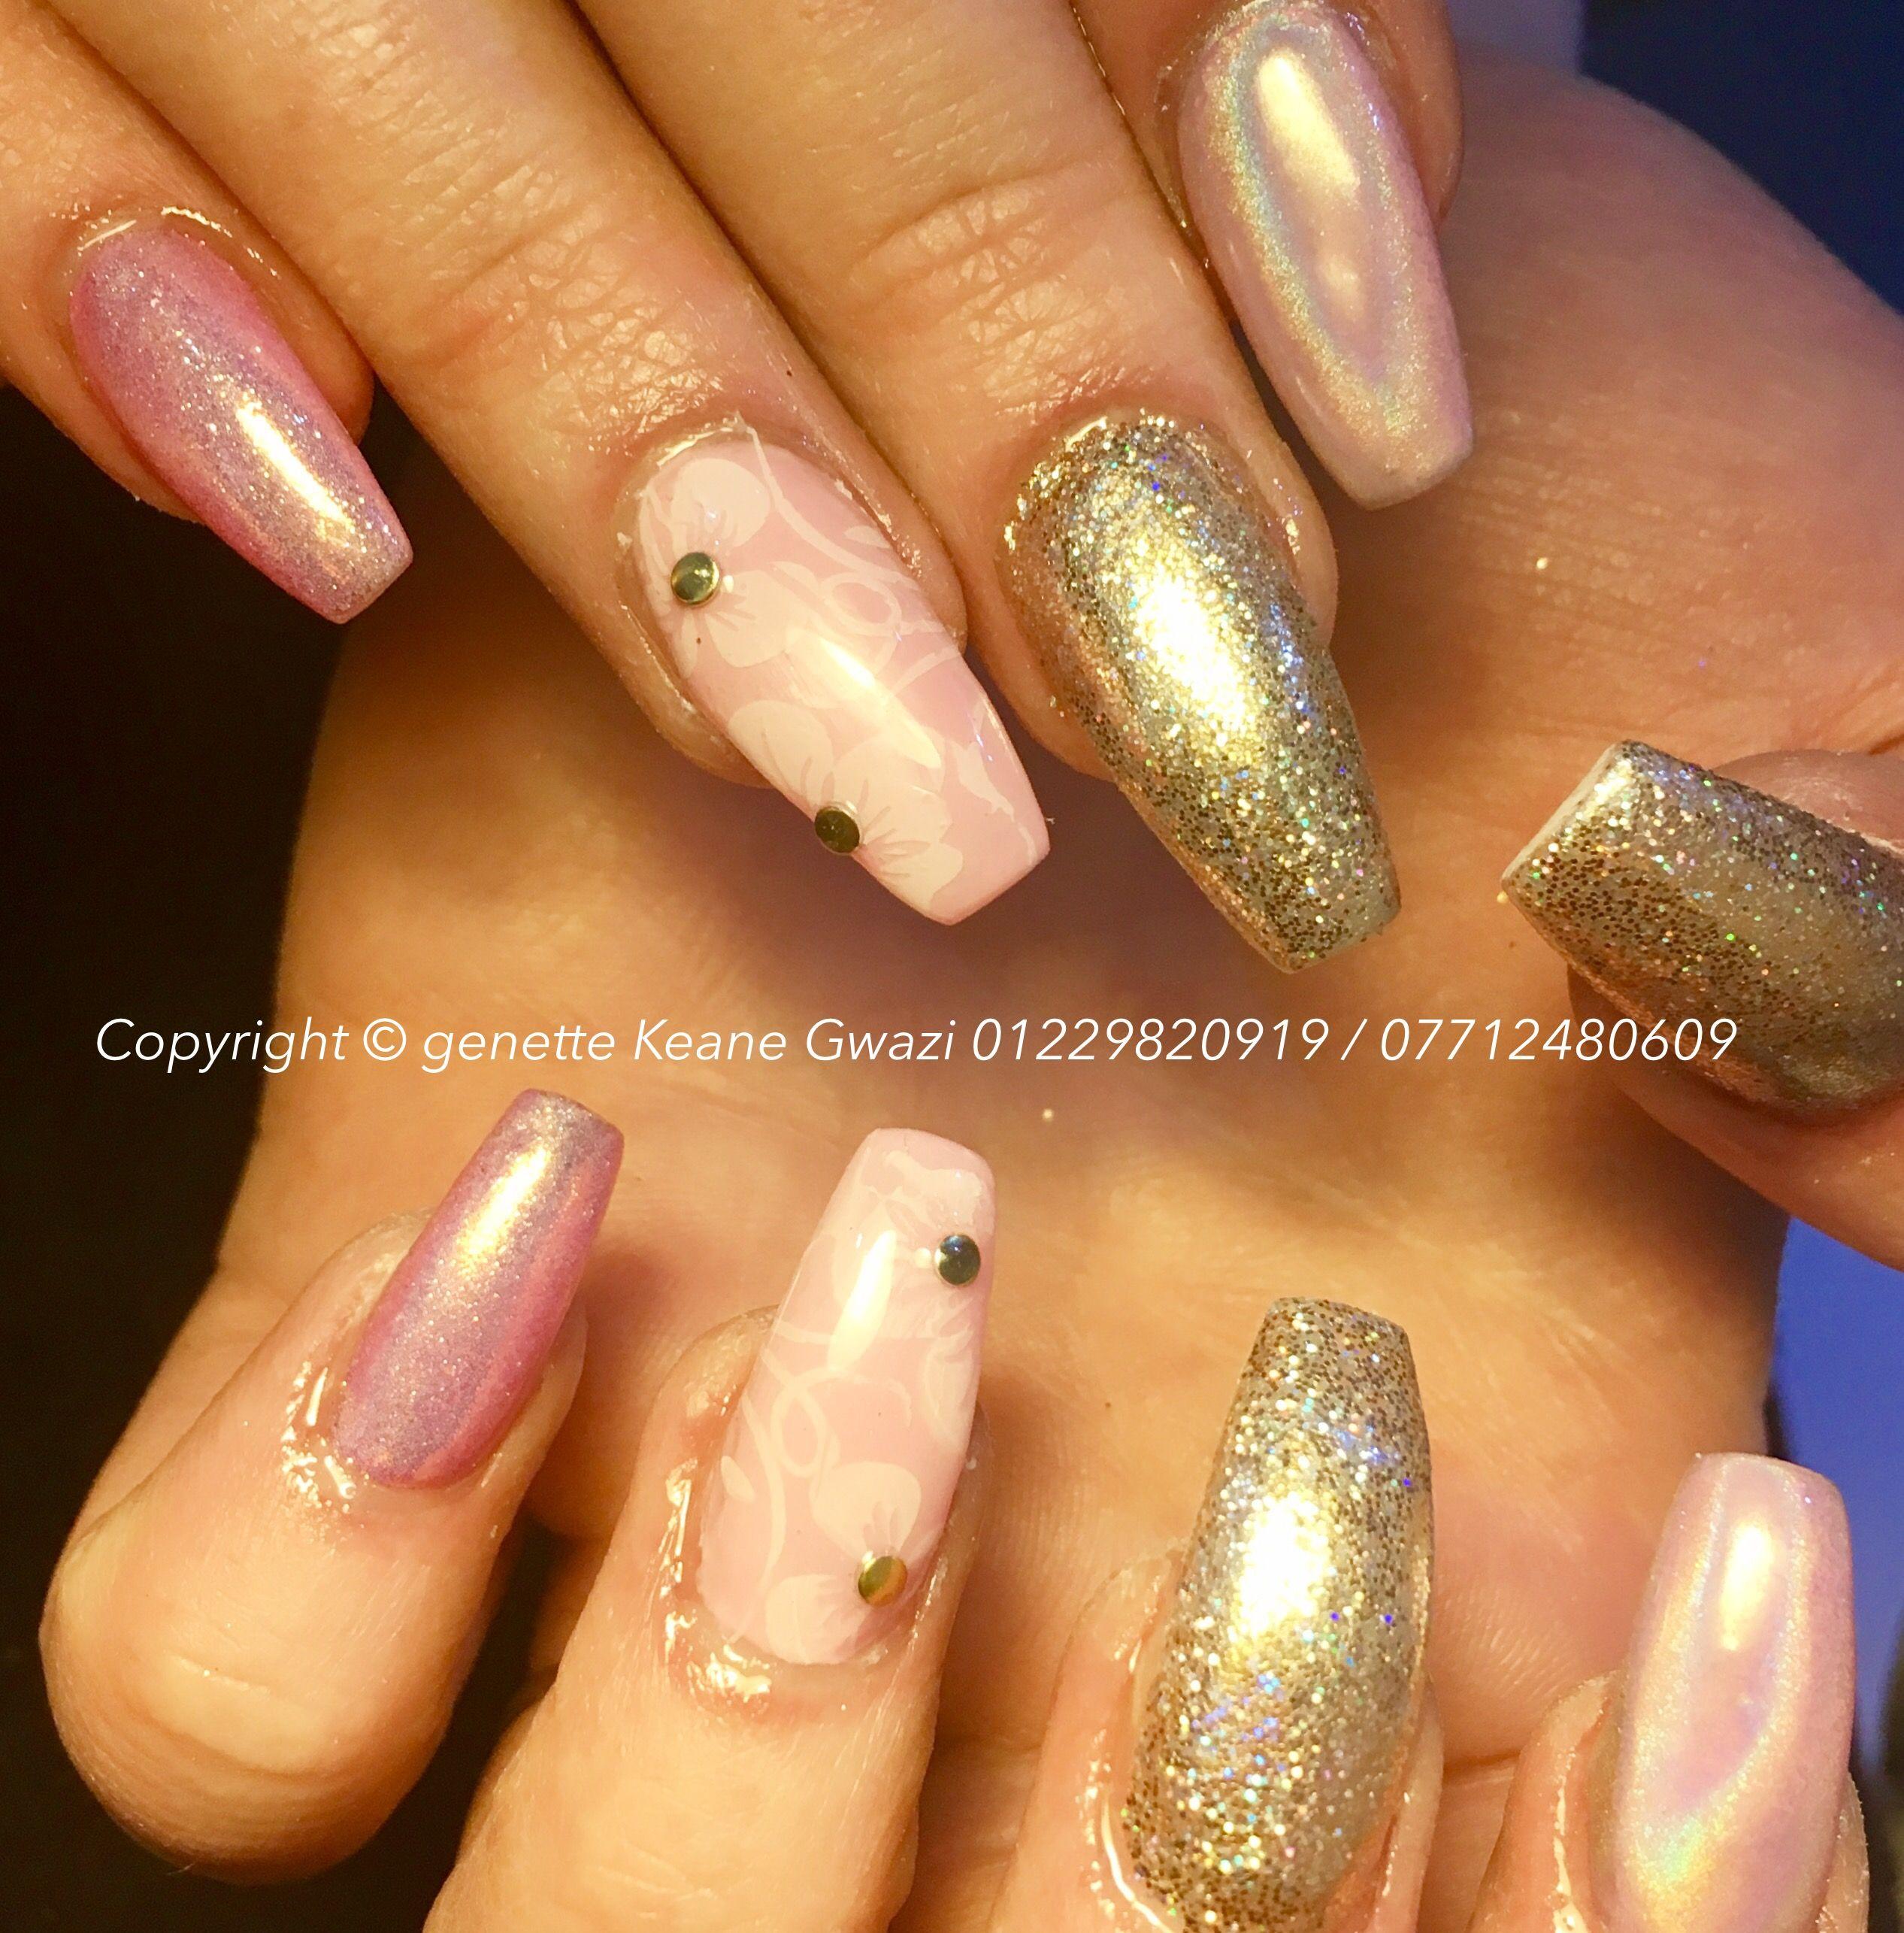 Coffin acrylic nails, pink mermaid powder / chrome, gold holographic nail glitter & stamping nail art. CND shellac gel finish.